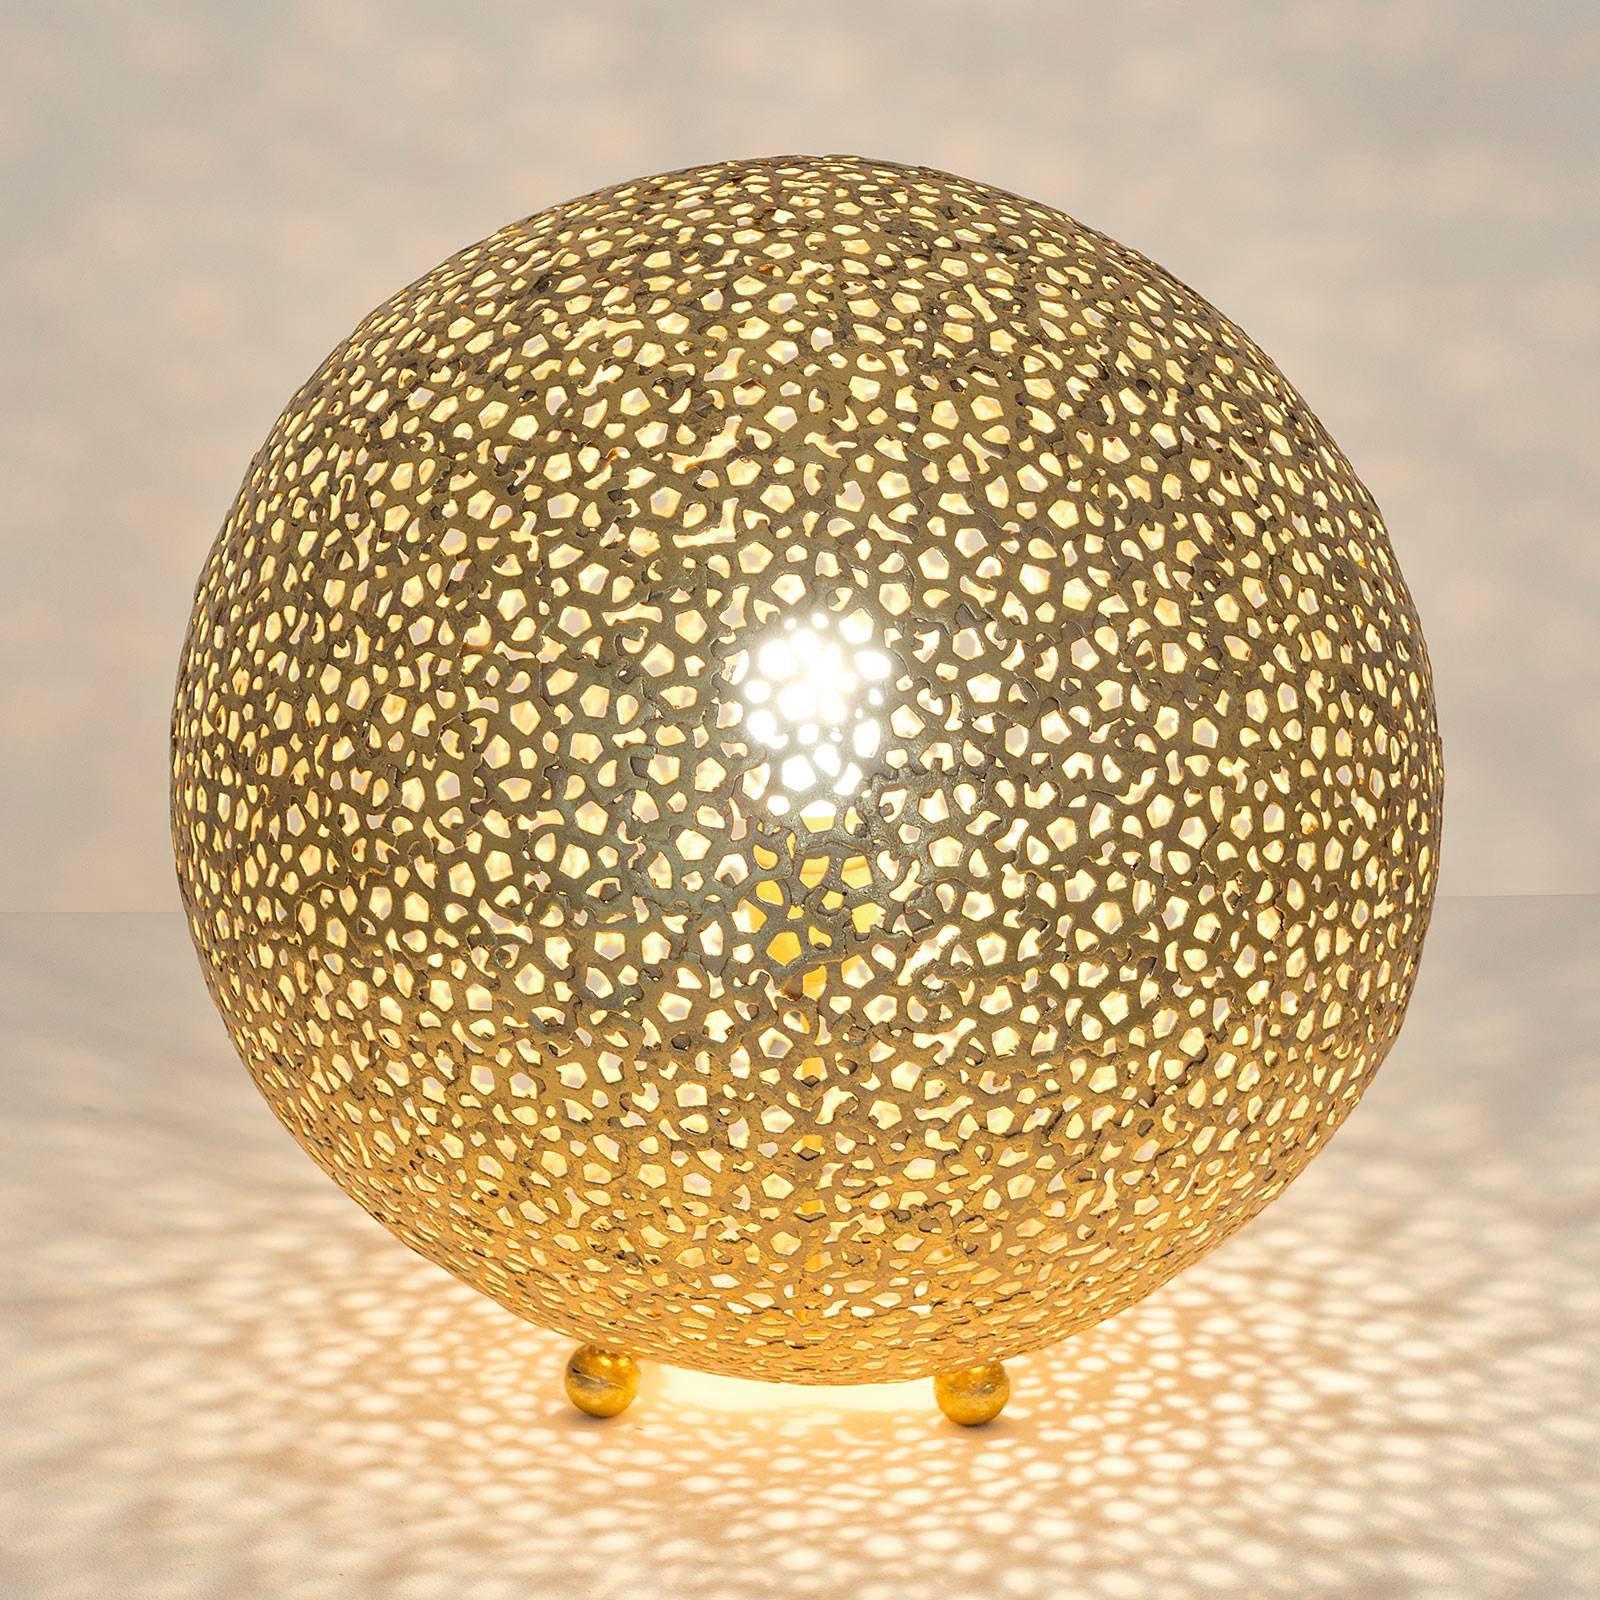 Bordlampe Lily Grande, Ø 43 cm, gull